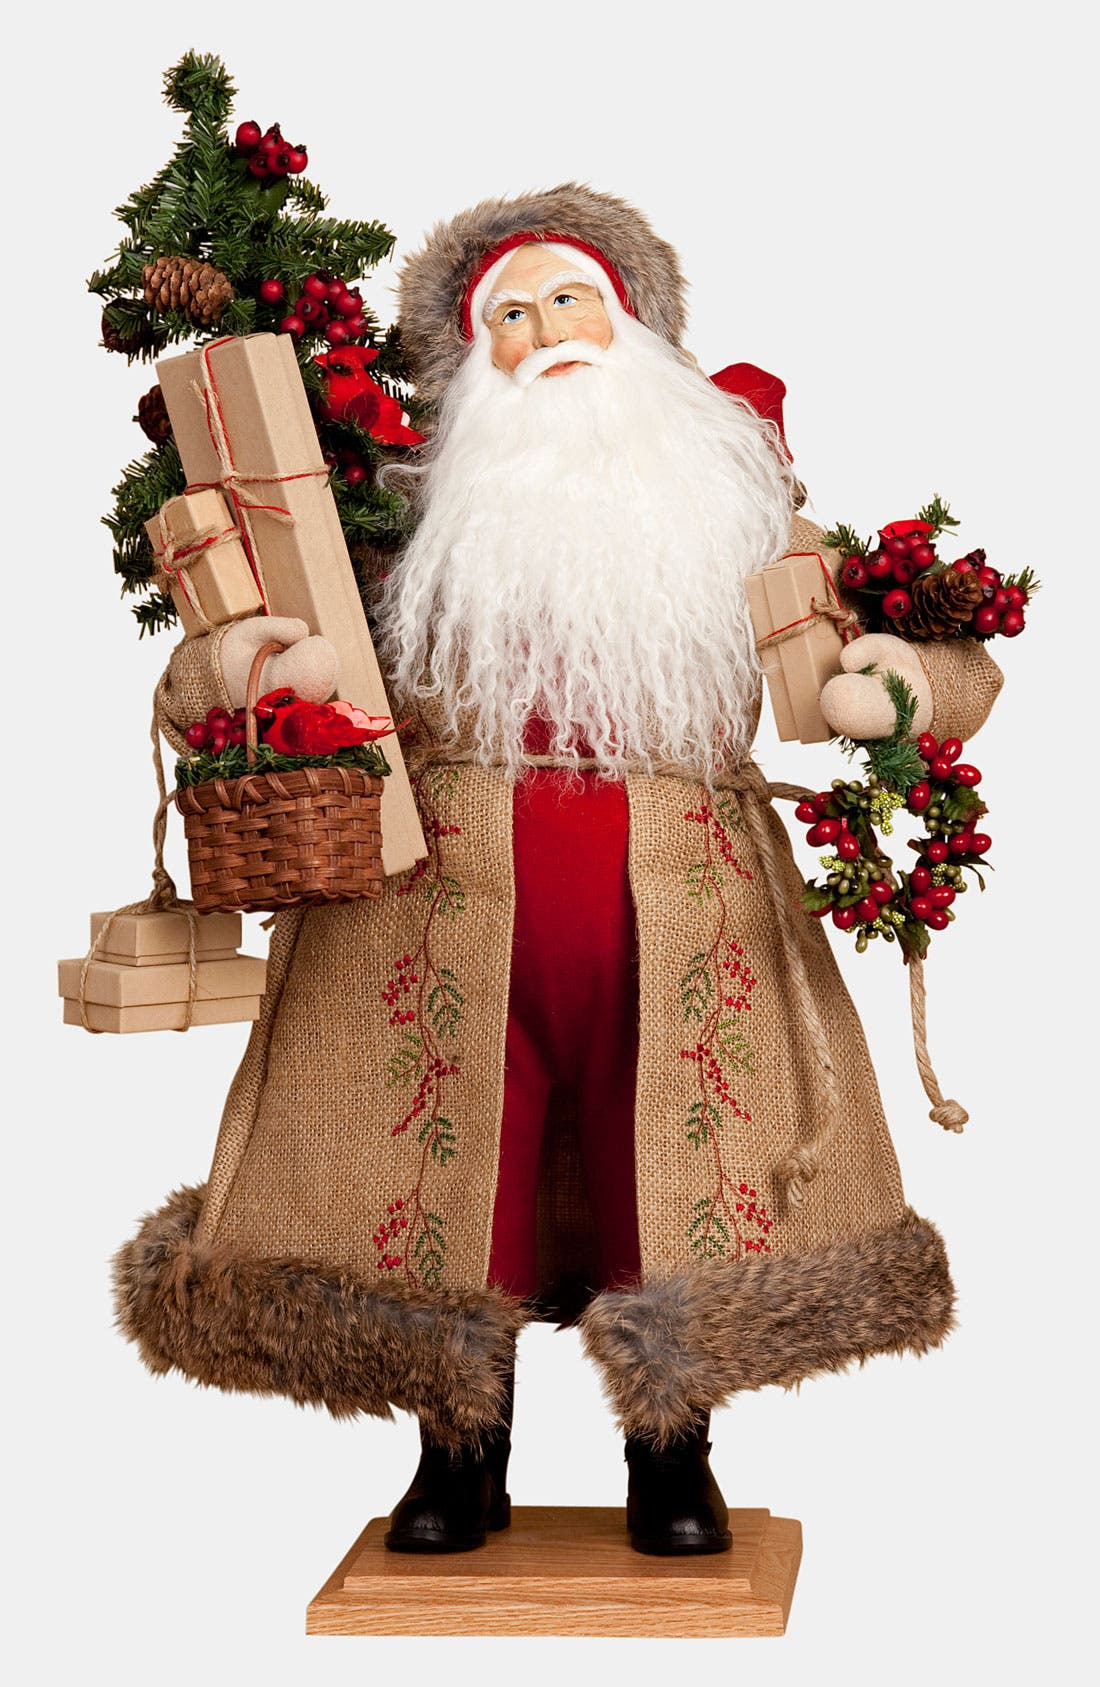 Alternate Image 1 Selected - Lynn Haney 'Countryside Holiday' Santa Figurine